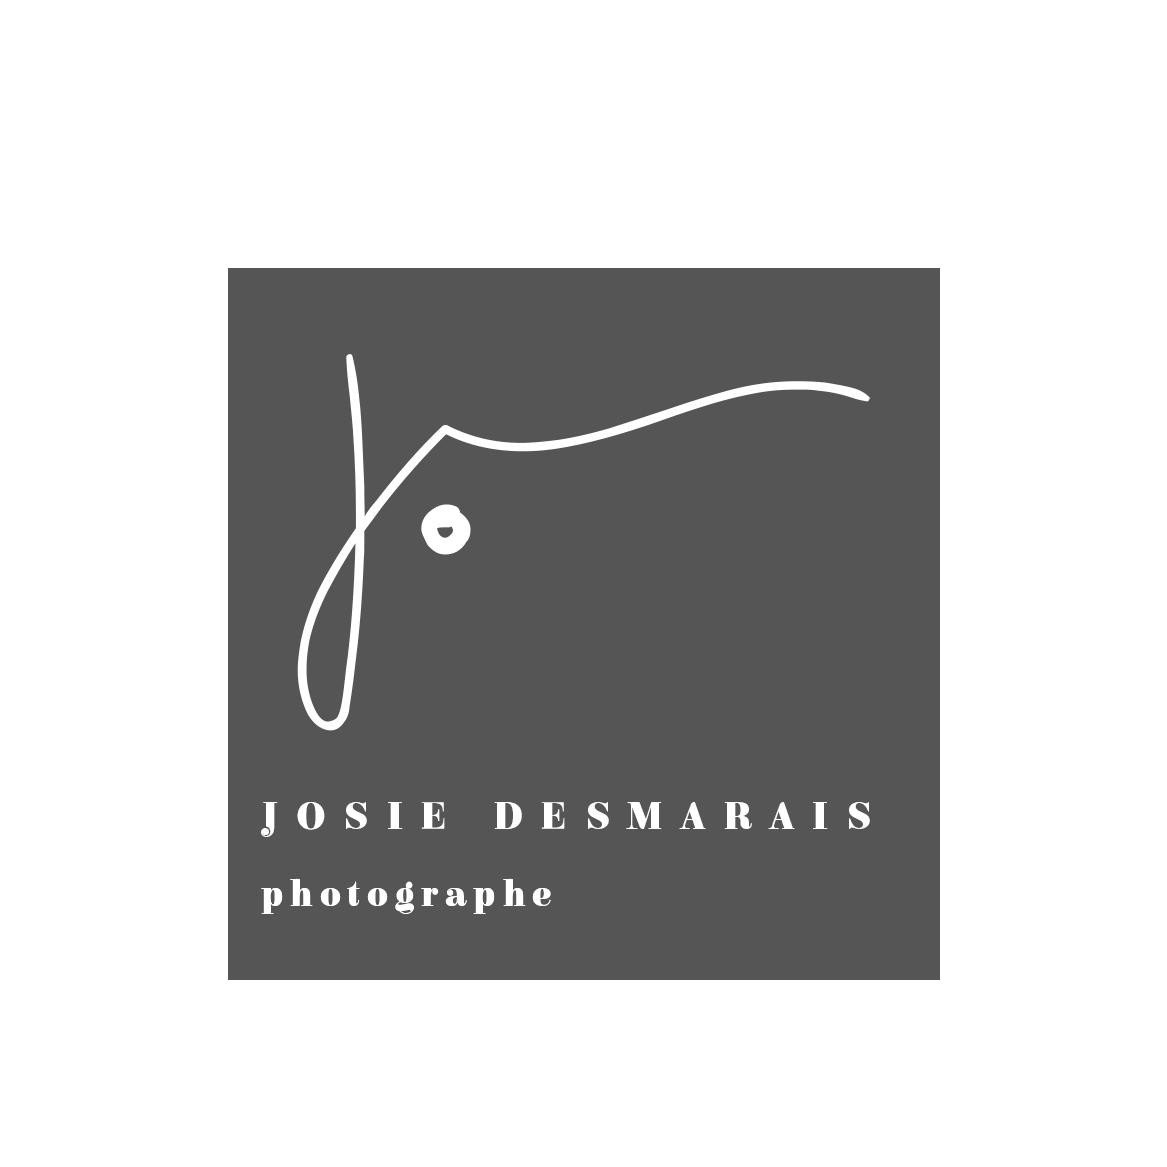 Josie Desmarais